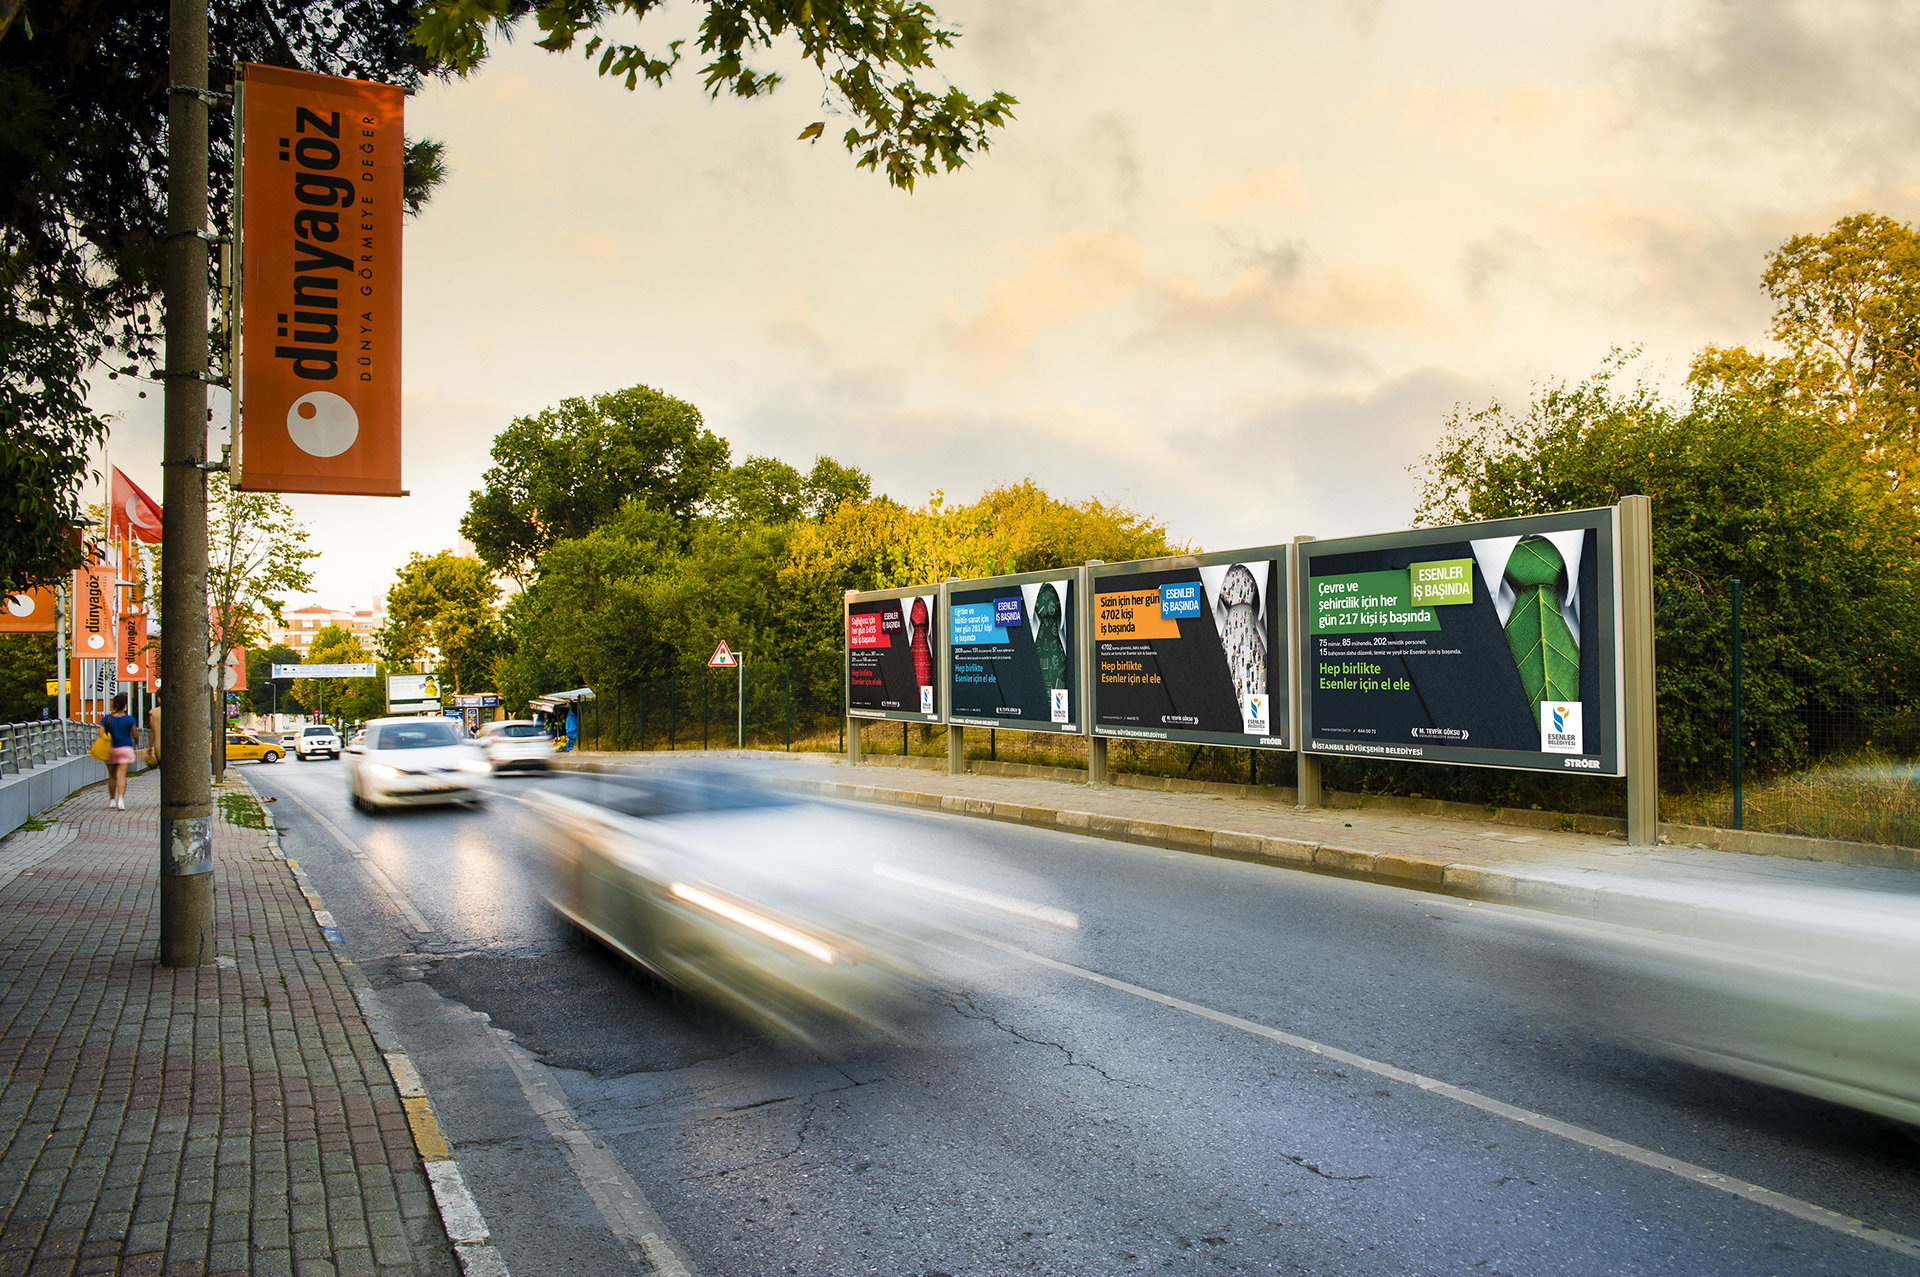 Бигборд или билборд: какой вариант верен?